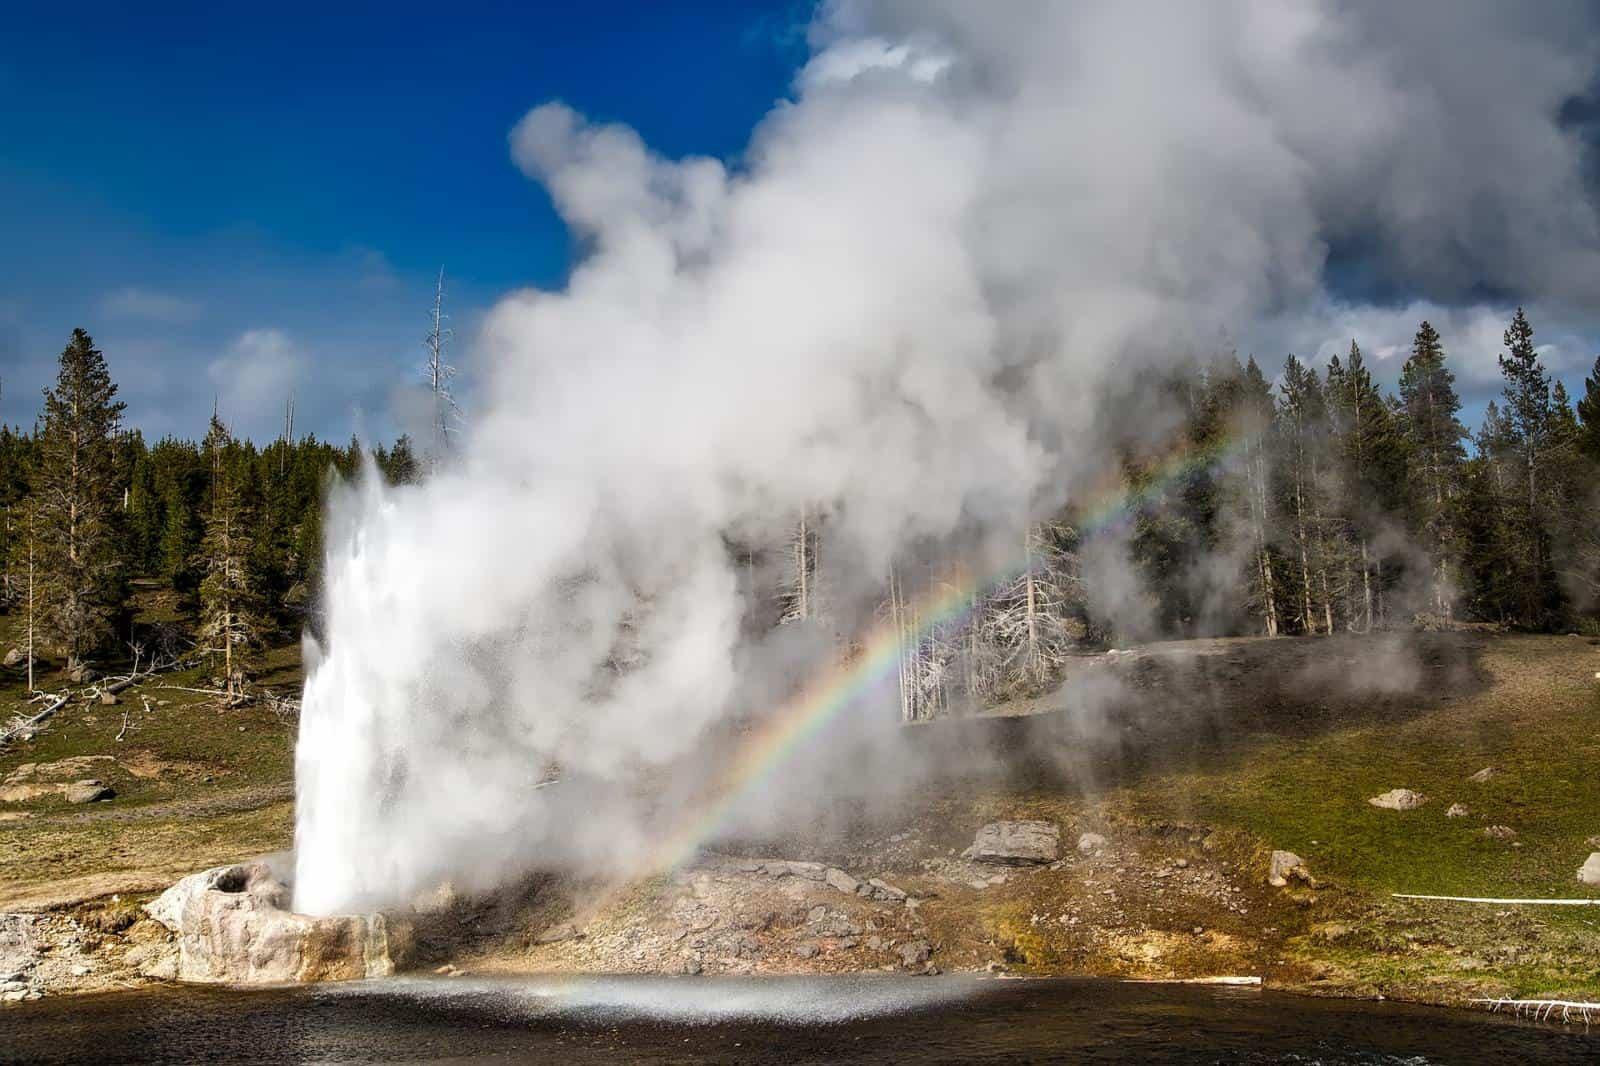 Best Geysers in Yellowstone - The Riverside Geyser